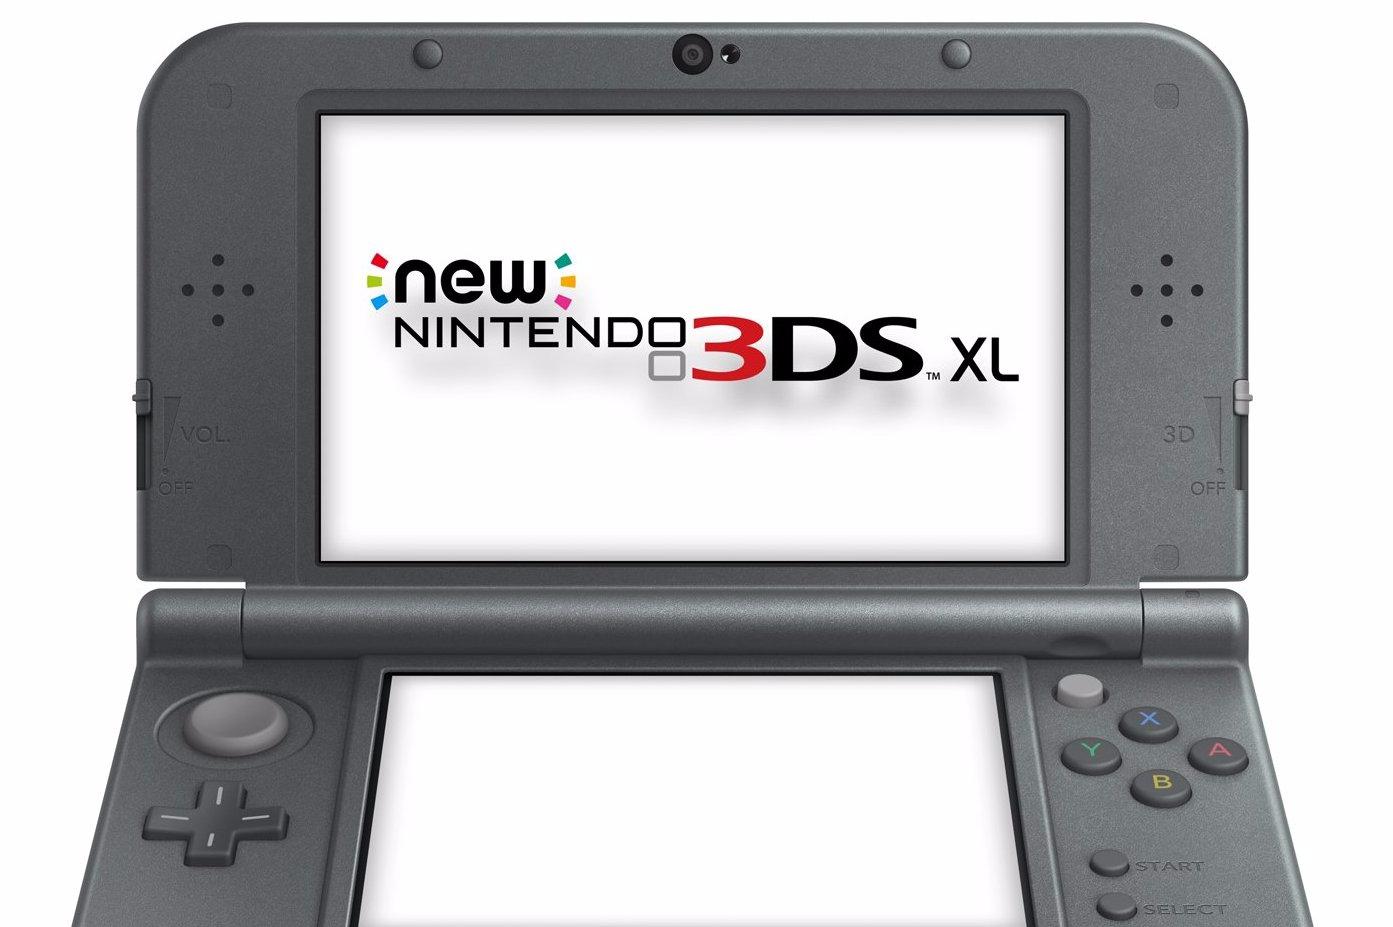 Modojo | New Nintendo 3DS sales bolstering slagging hardware market